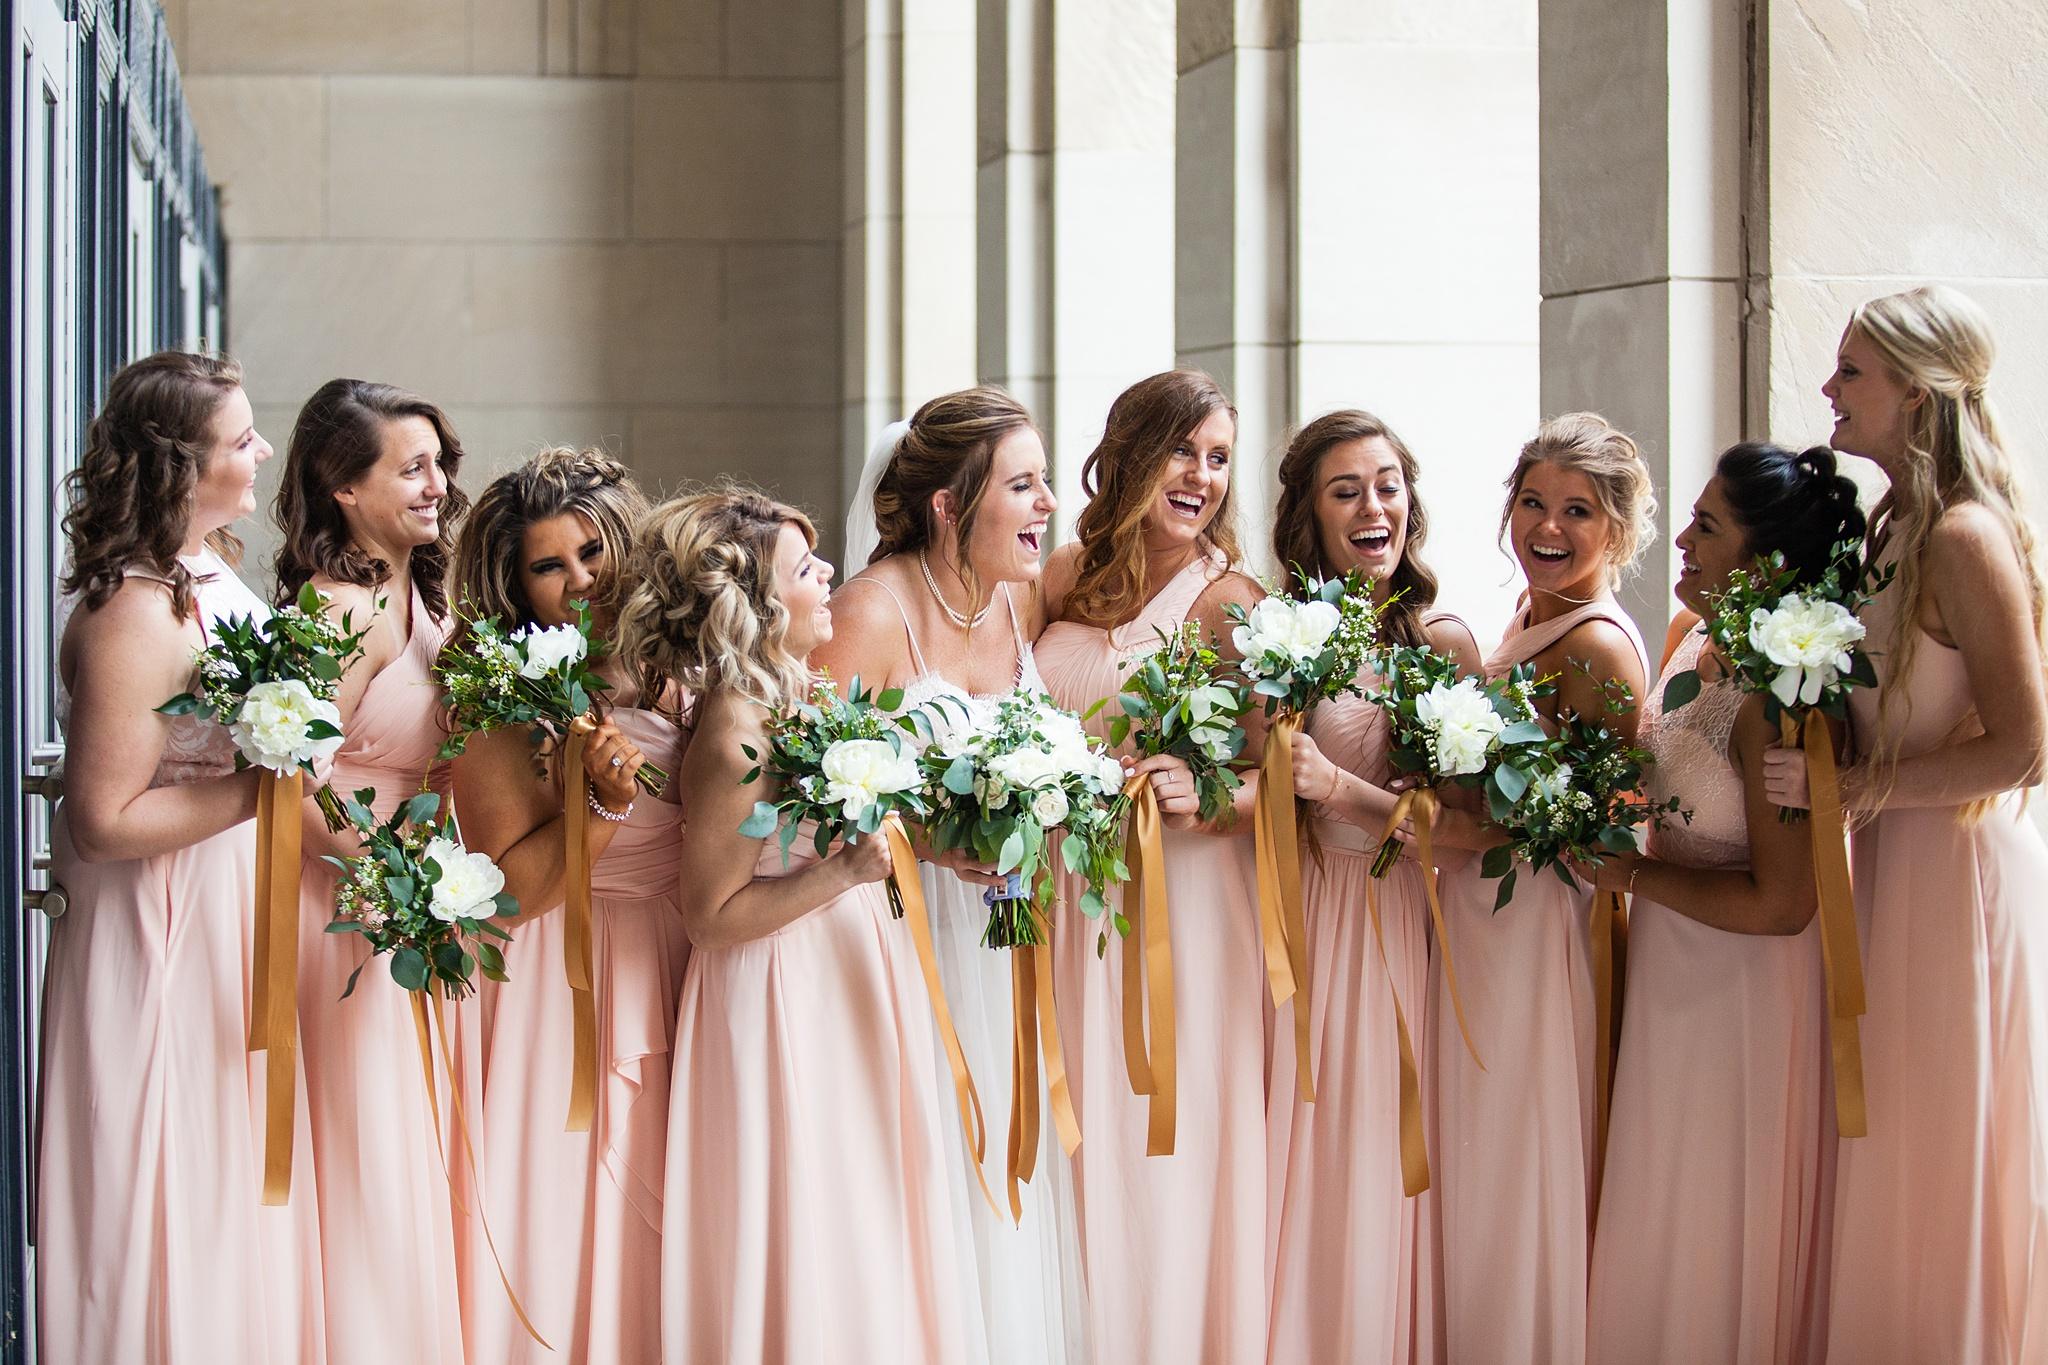 Meghan_Drew_Grand_Rapids_Cheney_place_Wedding040.JPG